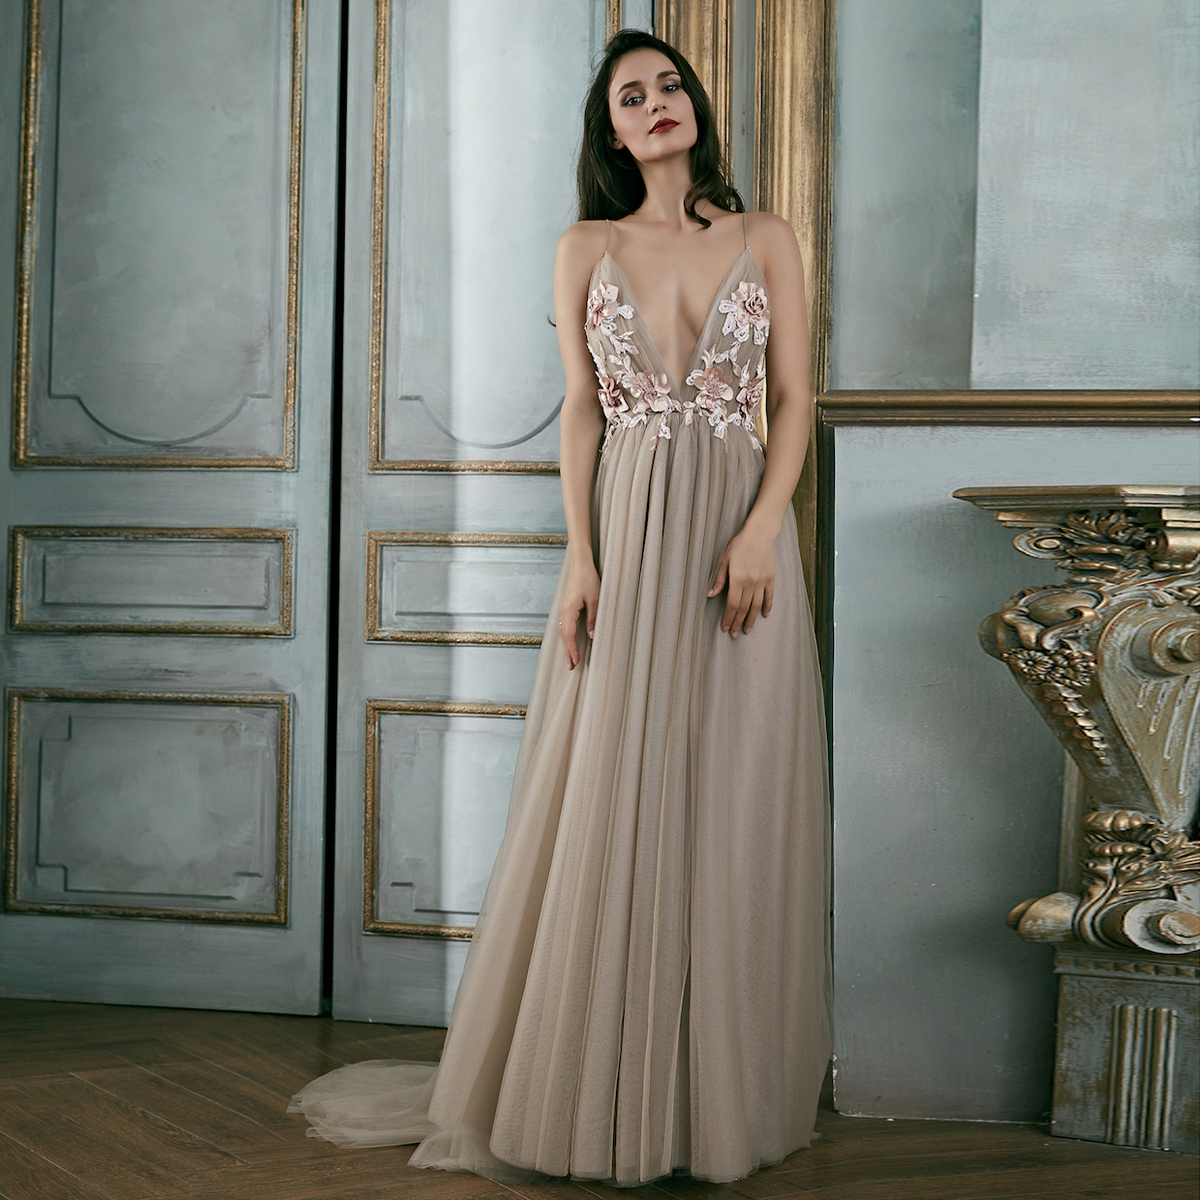 Elegante Rückenfreies Abendkleid Ballkleid Spaghettiträger Tiefer V  Ausschnitt Lang Taupe Tüll Blumen